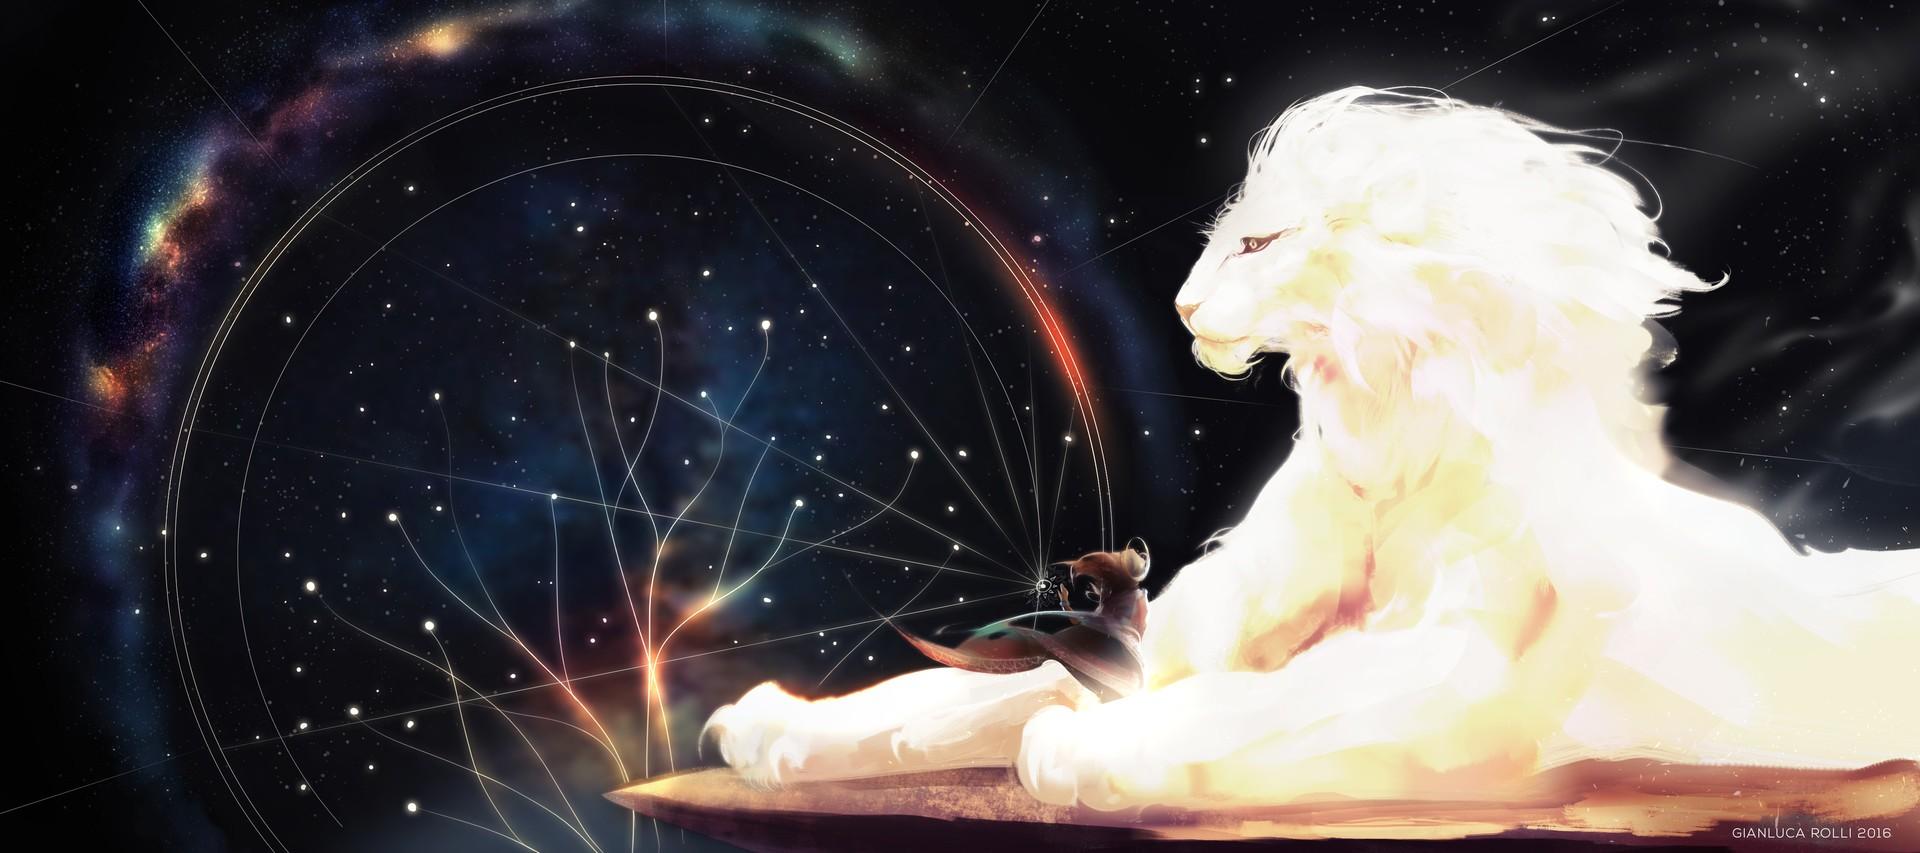 Wallpaper Digital Art Fantasy Art Space Lion Screenshot Special Effects 1920x853 Kejsirajbek 738 Hd Wallpapers Wallhere